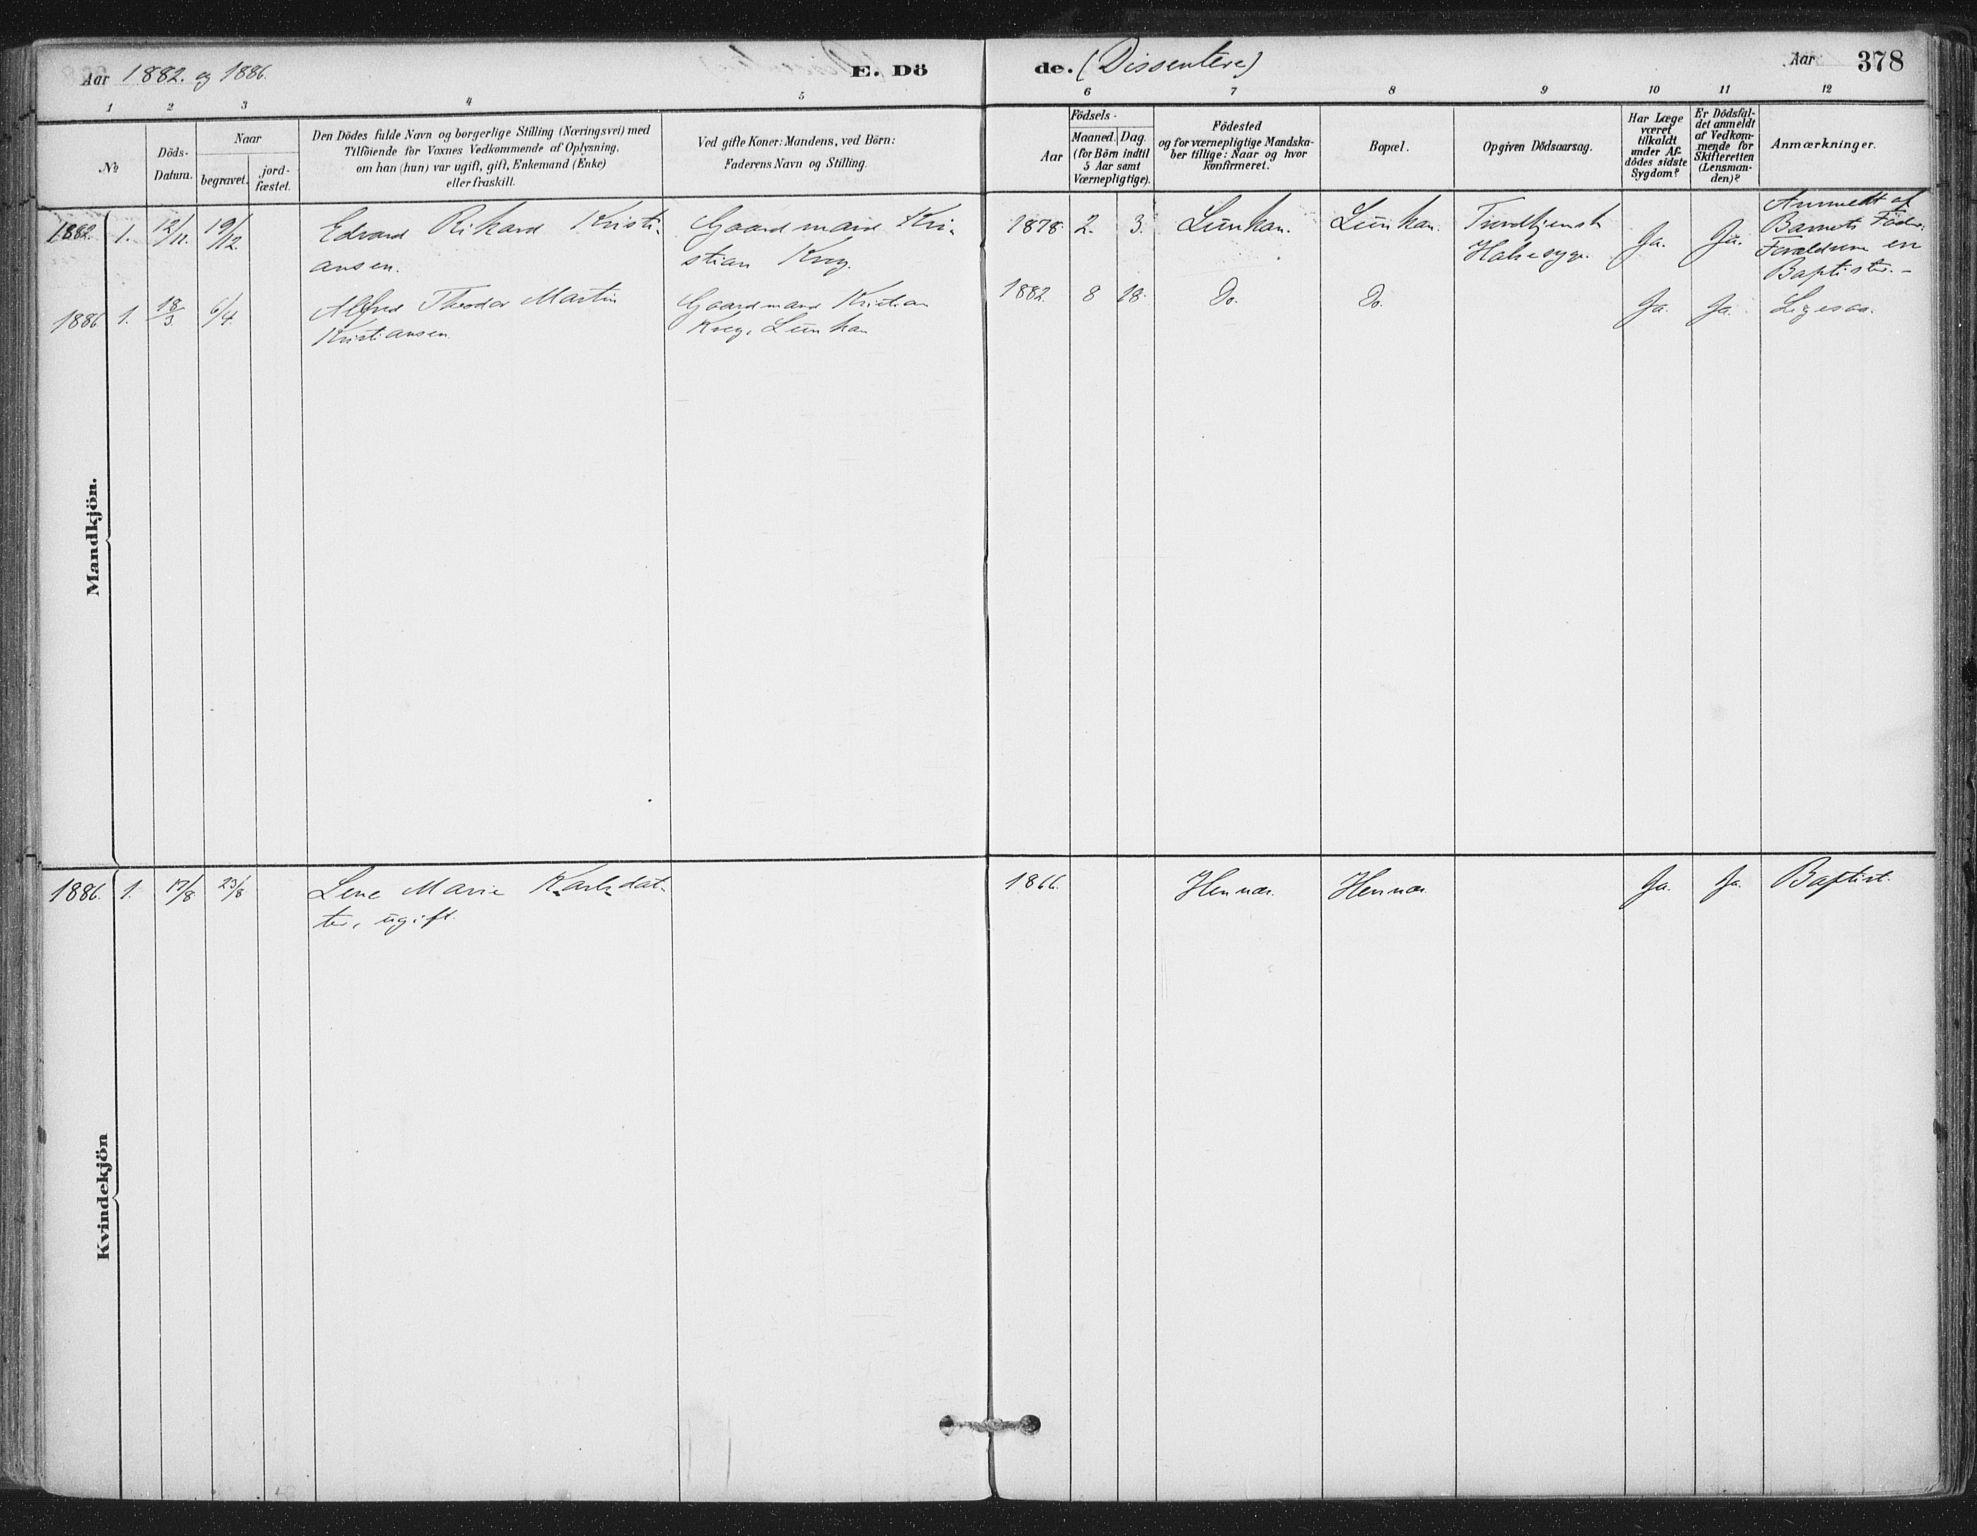 SAT, Ministerialprotokoller, klokkerbøker og fødselsregistre - Nordland, 888/L1244: Ministerialbok nr. 888A10, 1880-1890, s. 376